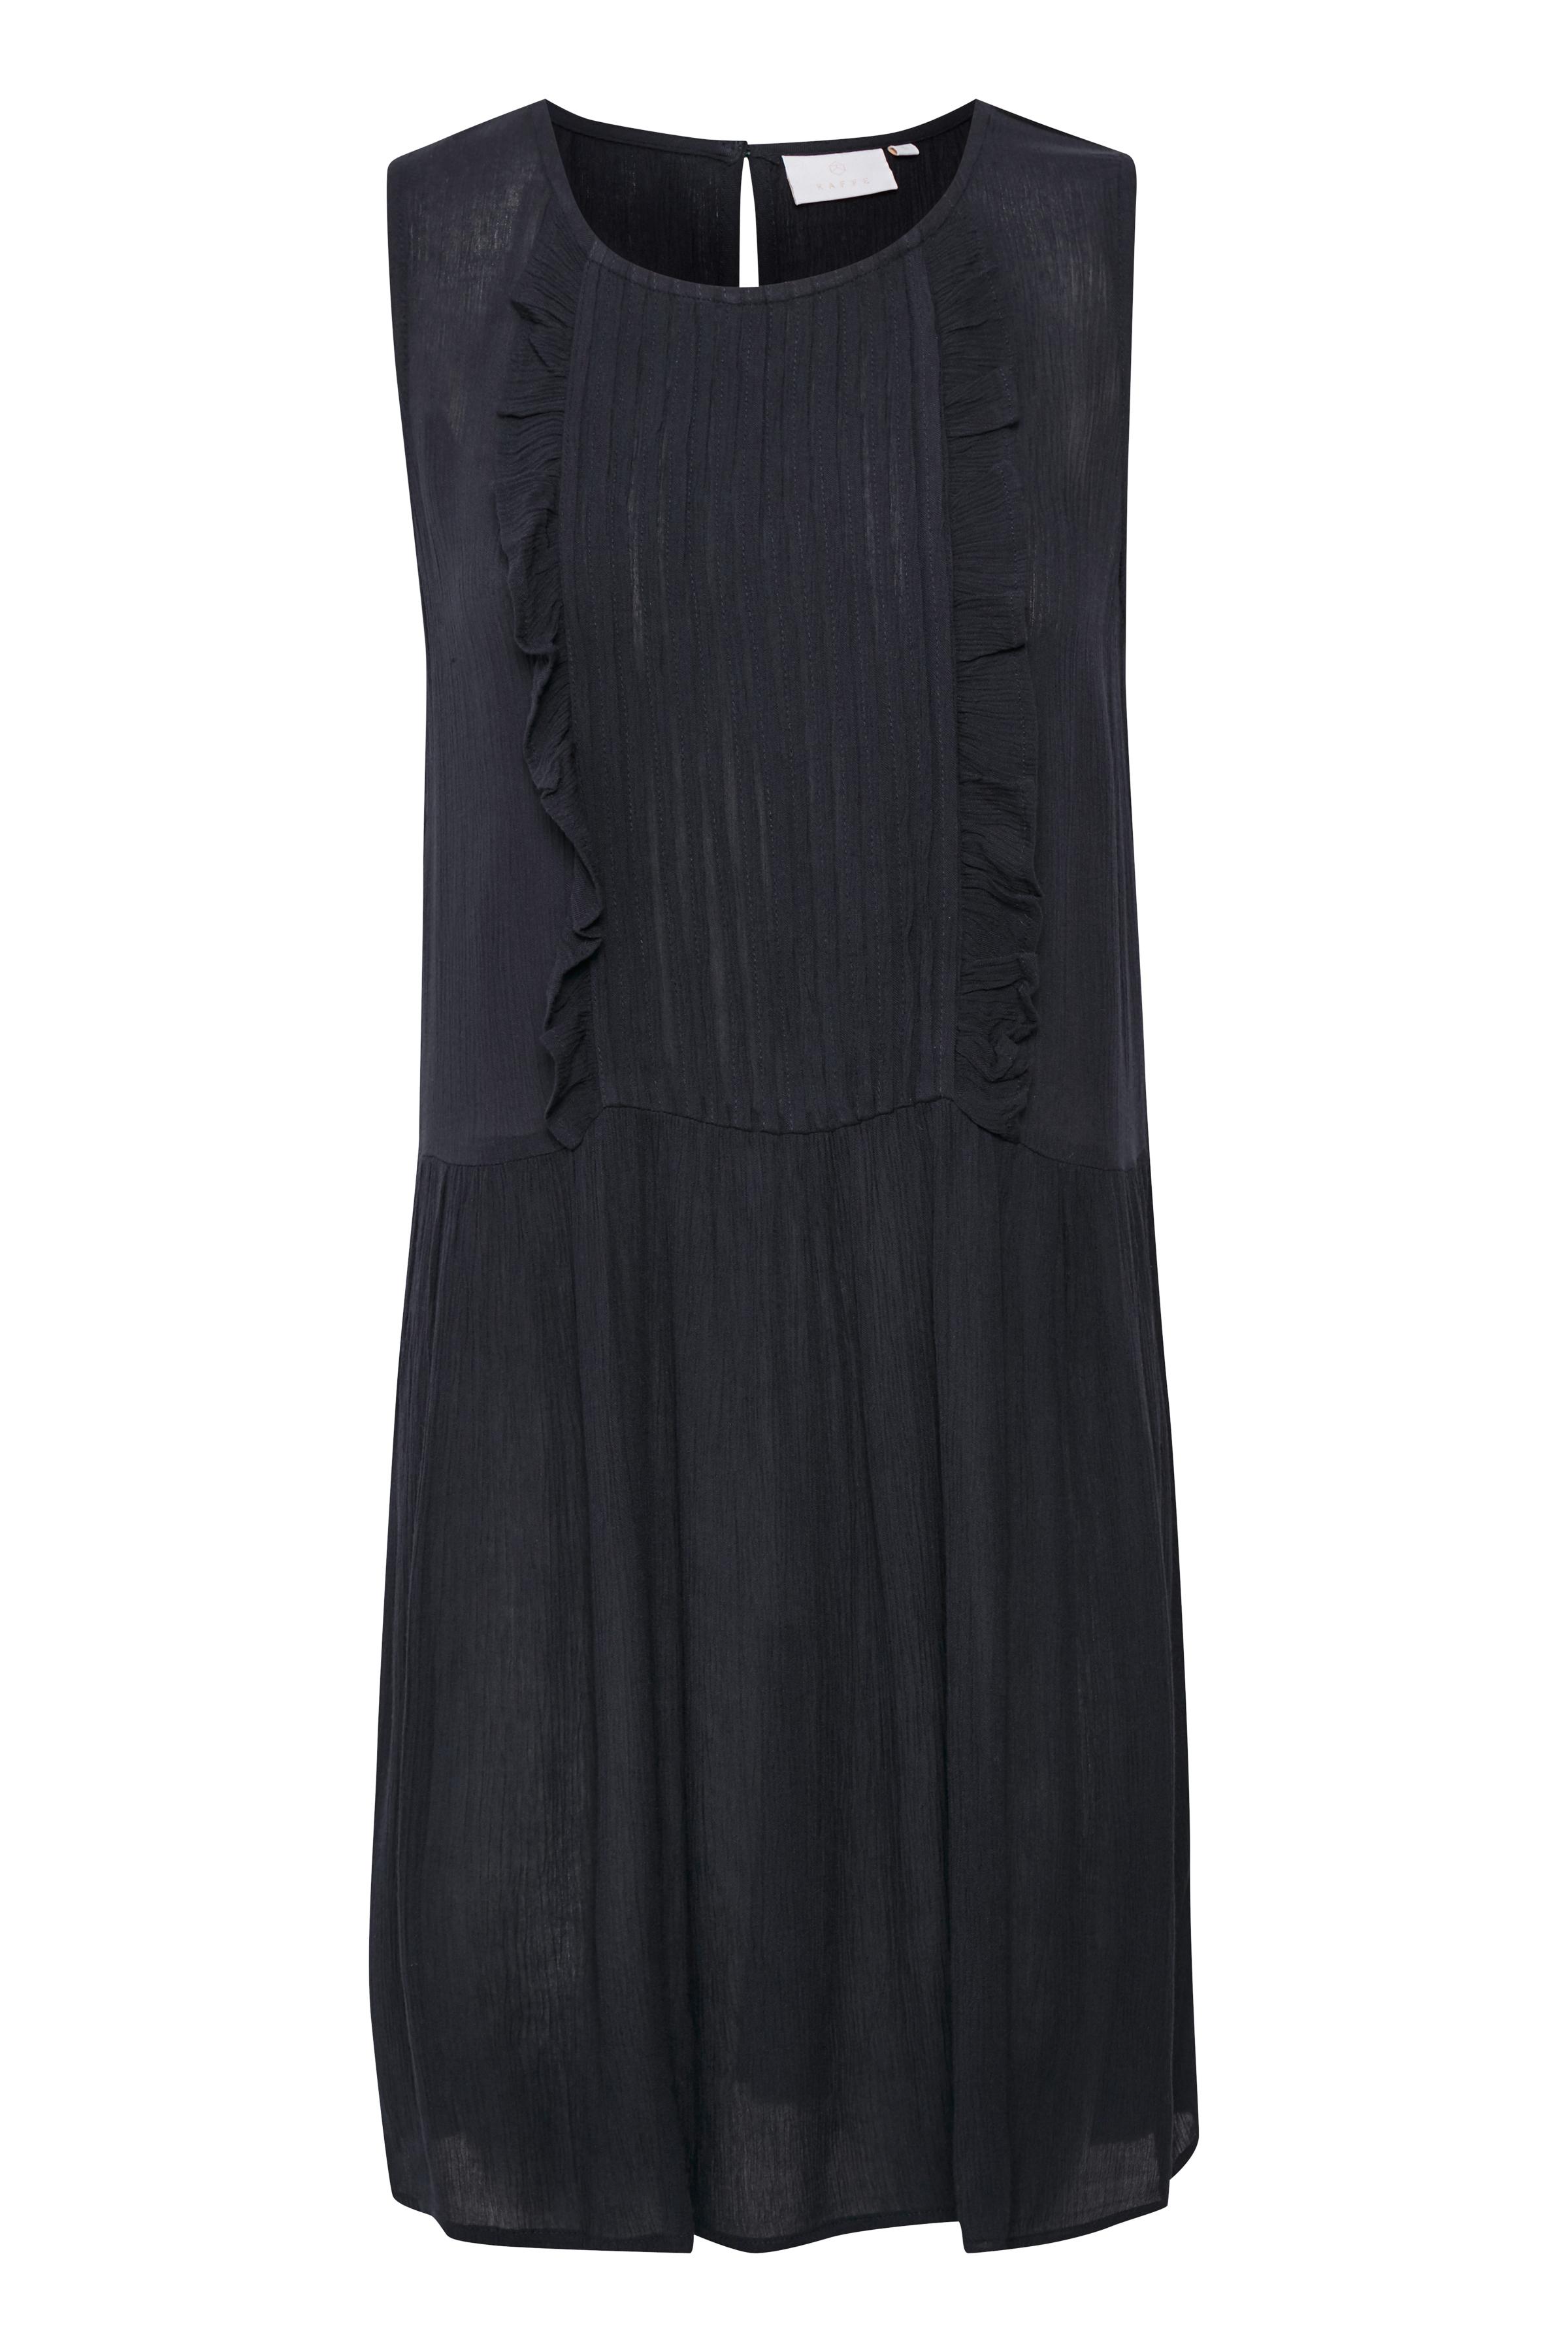 Marineblau Kleid von Kaffe – Shoppen SieMarineblau Kleid ab Gr. 34-46 hier